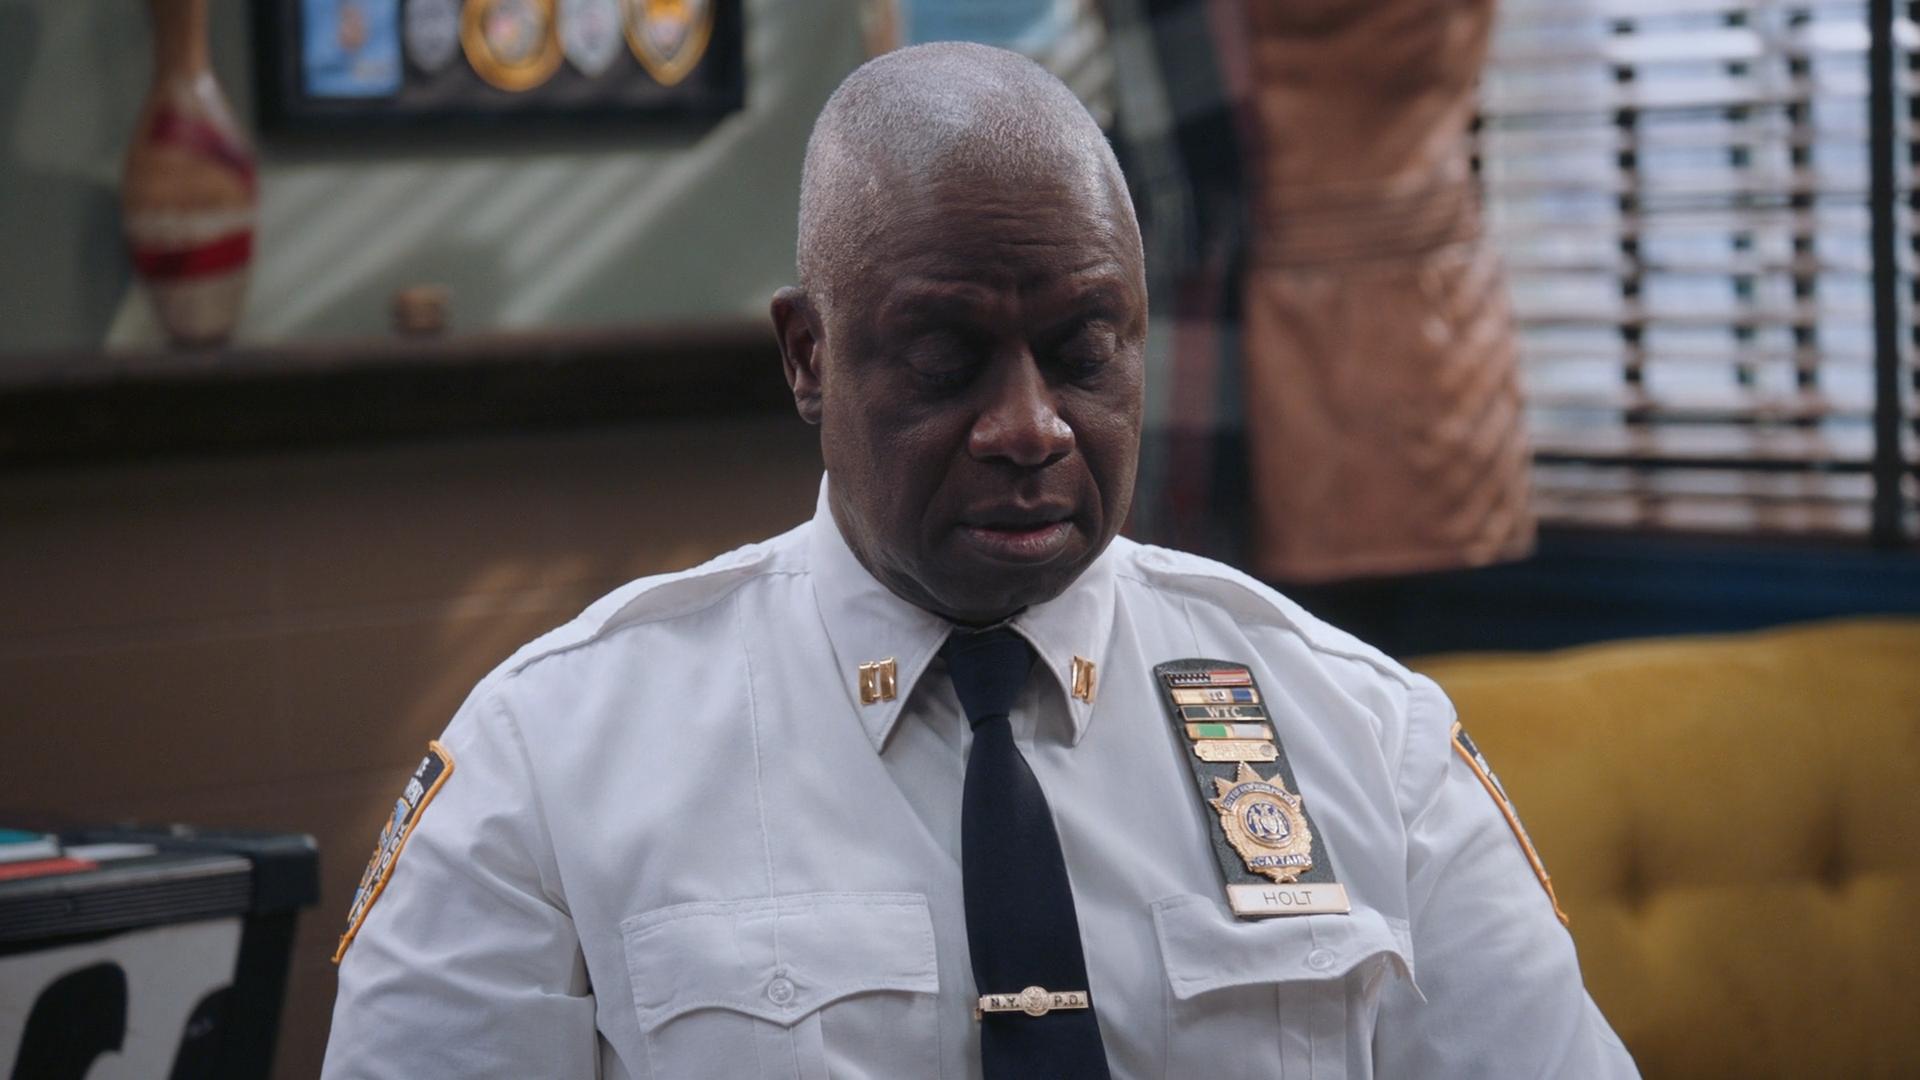 Brooklyn.Nine-Nine.S08E01.The.Good.Ones.1080p.AMZN.WEB-DL.DDP5.1.H.264-NTb.mkv_snapshot_04.png